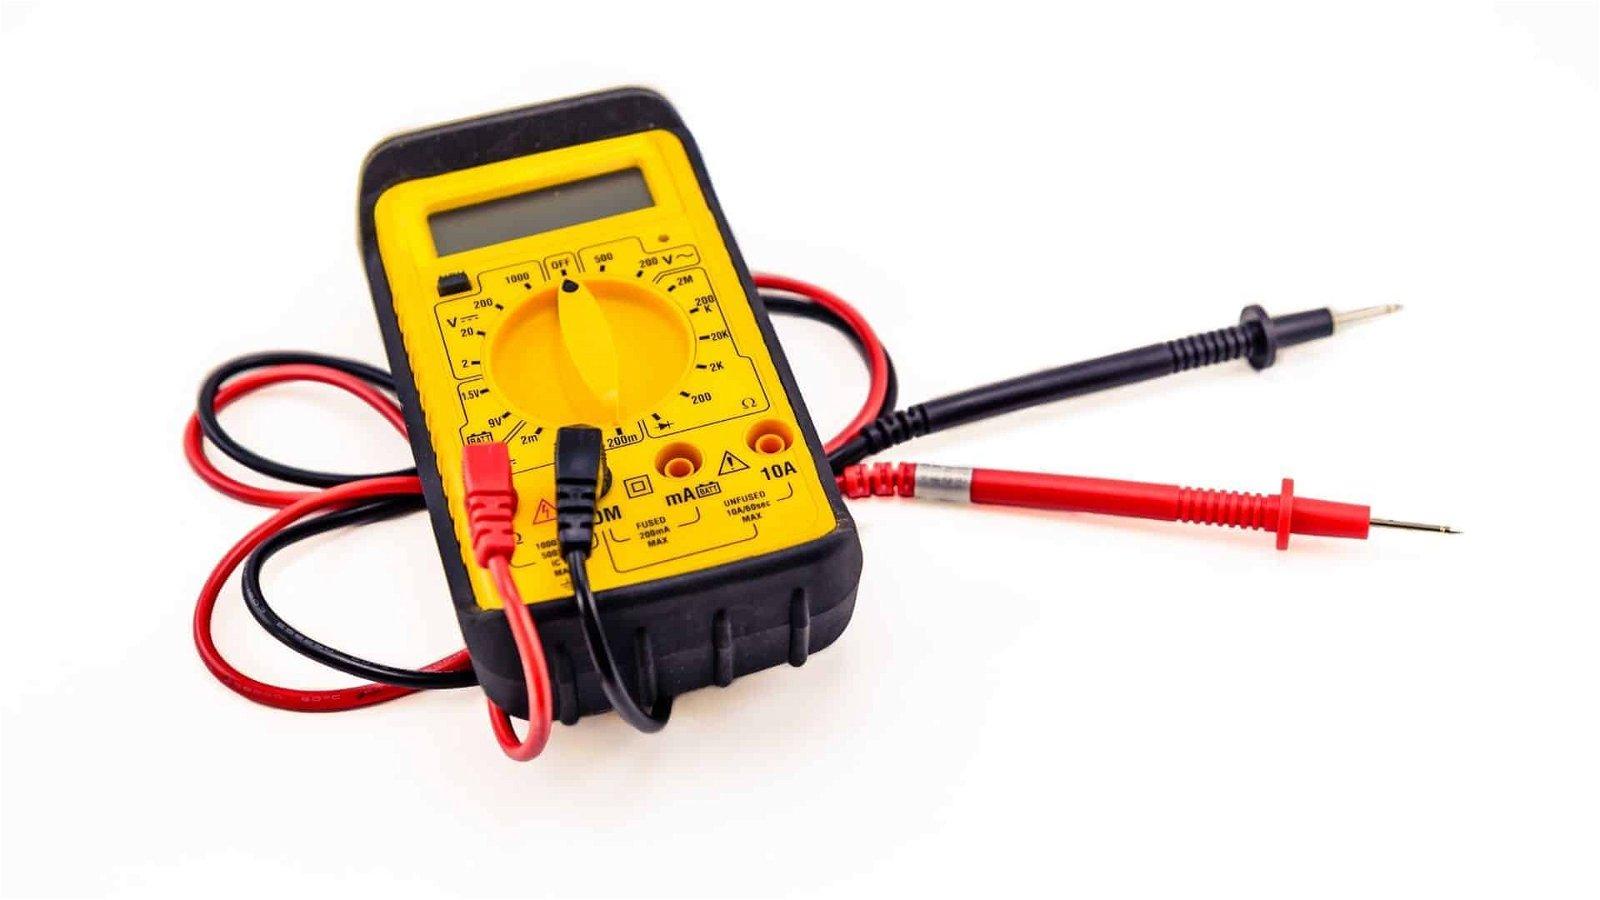 voltmeter to check phoneline